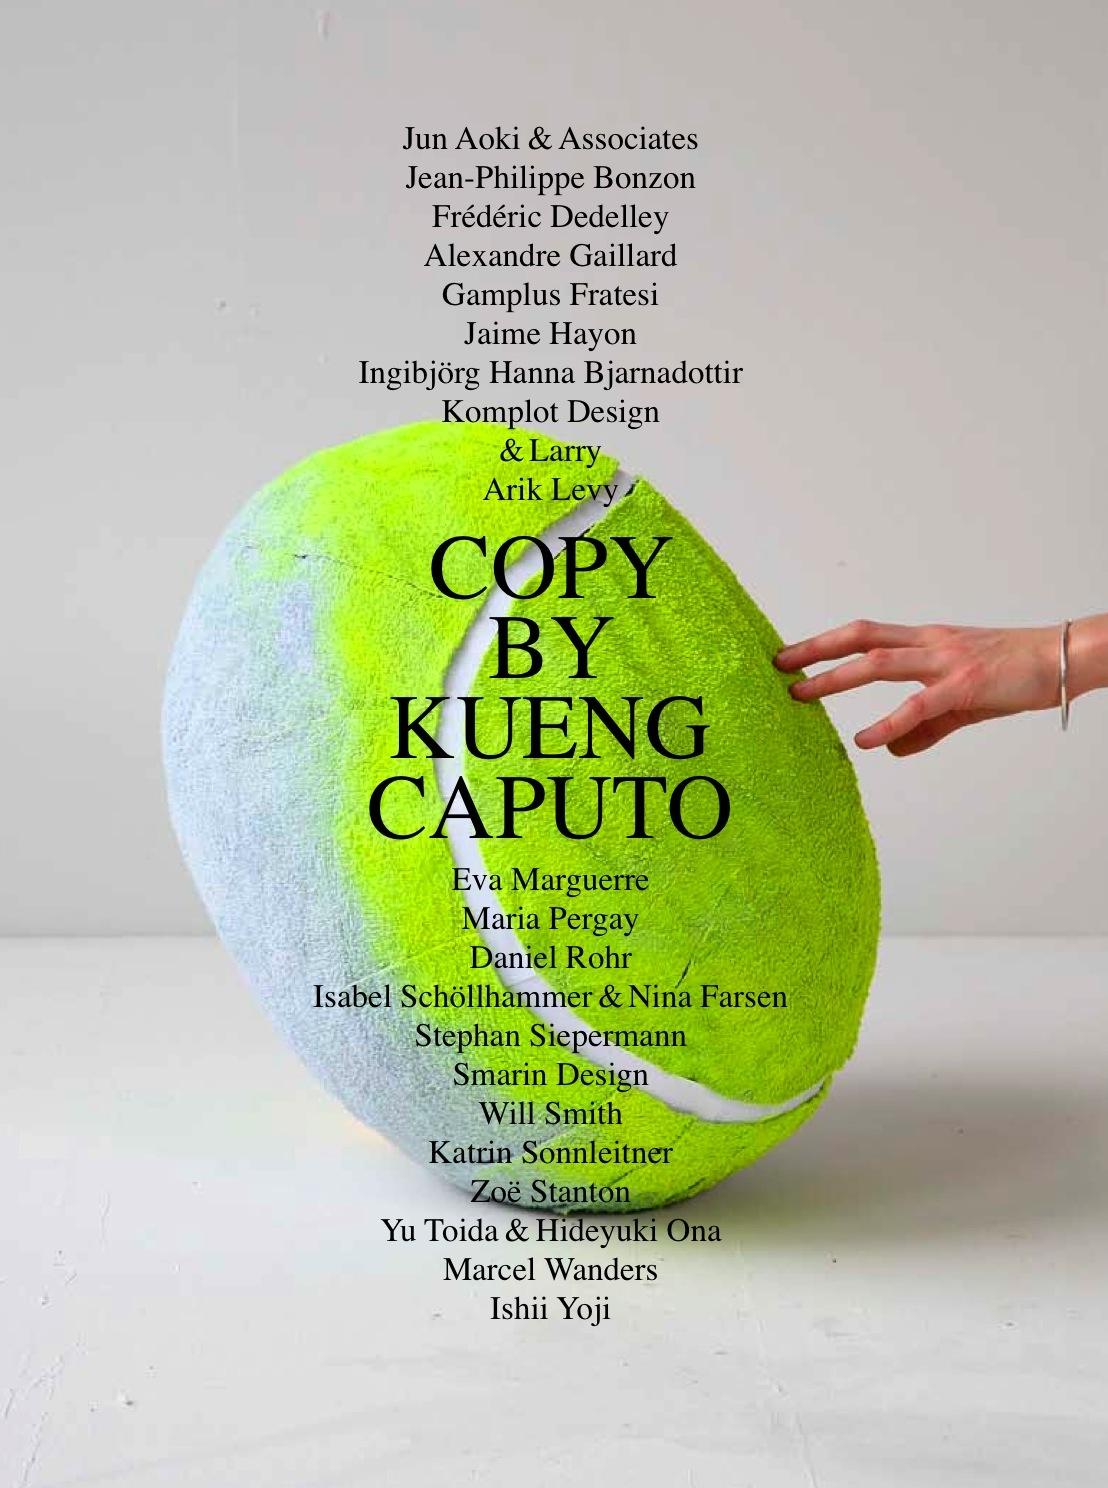 COPY BY KUENG-CAPUTO